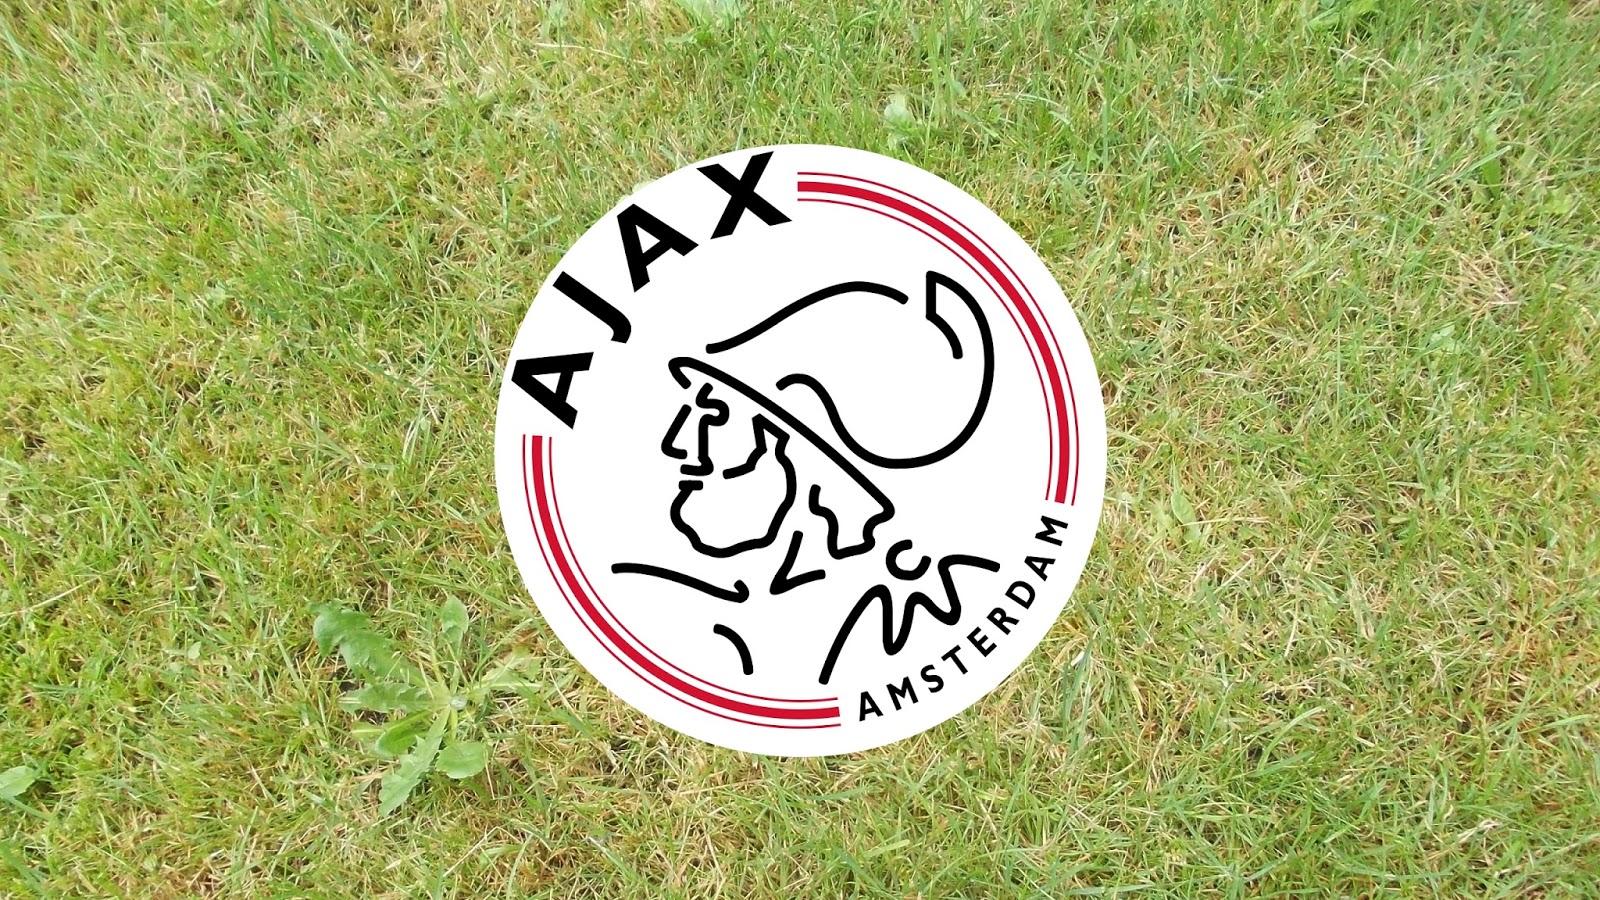 Ajax Wallpapers | HD Wallpapers